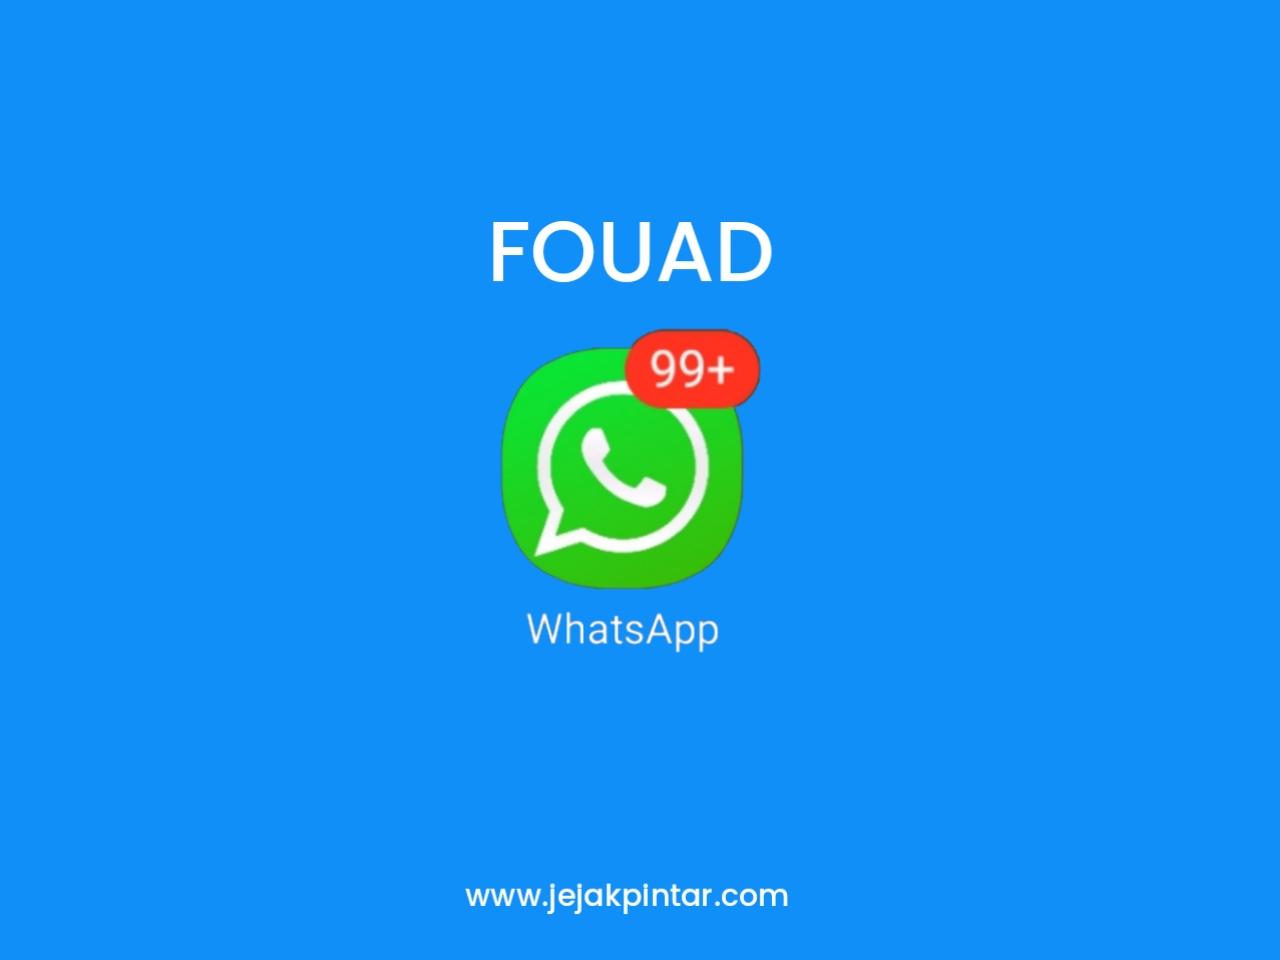 Download Fouad WhatsApp Mods APK Anti Banned Versi Terbaru 2020